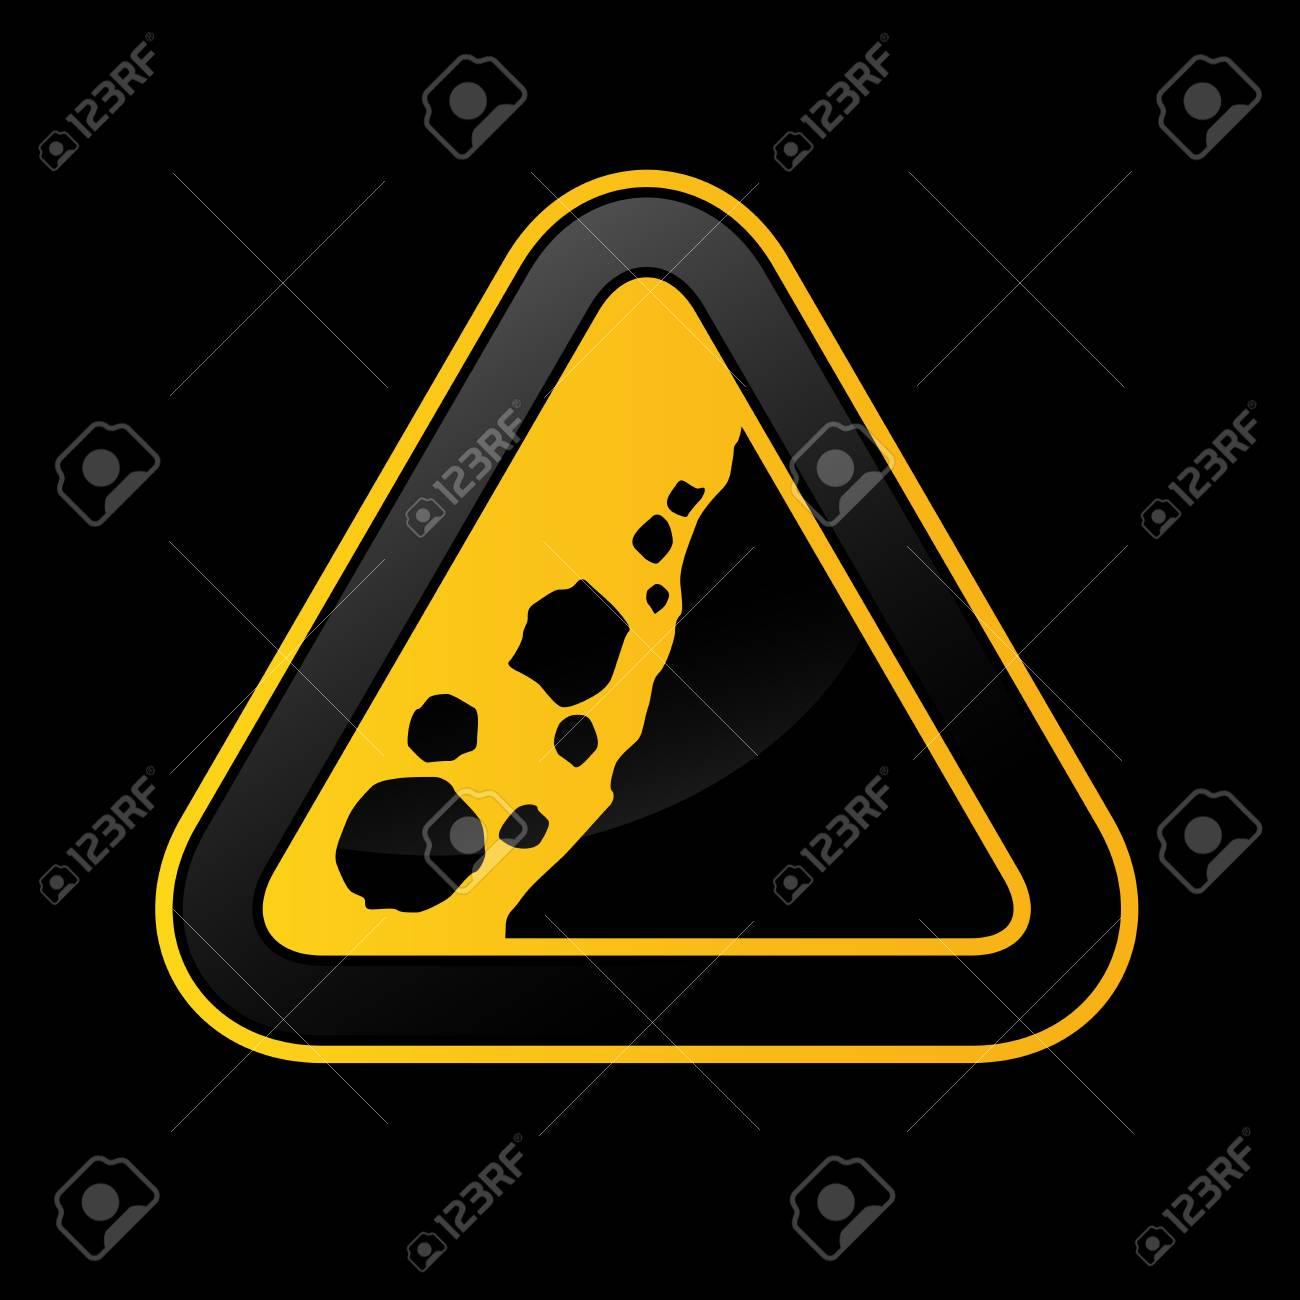 Rockfall triangular traffic sign on black background - rockslide icon - 105311054